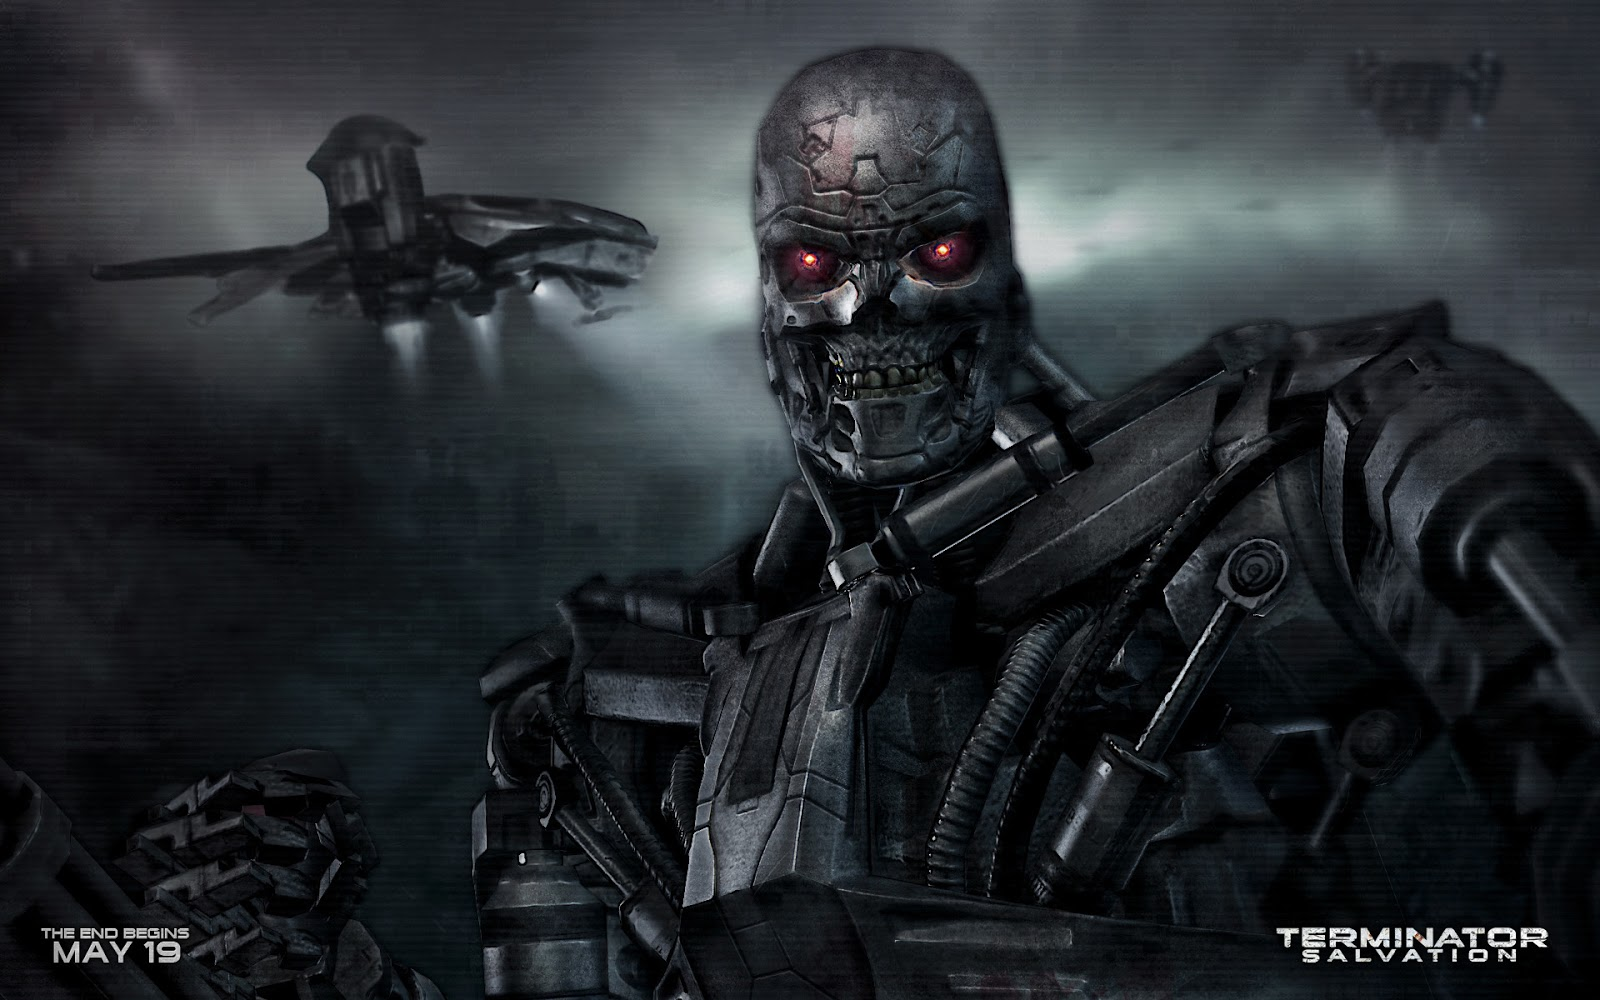 http://3.bp.blogspot.com/--Sj0sW2Iu00/ULMfAU63AAI/AAAAAAAANgA/34ZCqh_Urjk/s1600/Terminator+Salvation+-+Wallpaper+HD.jpg